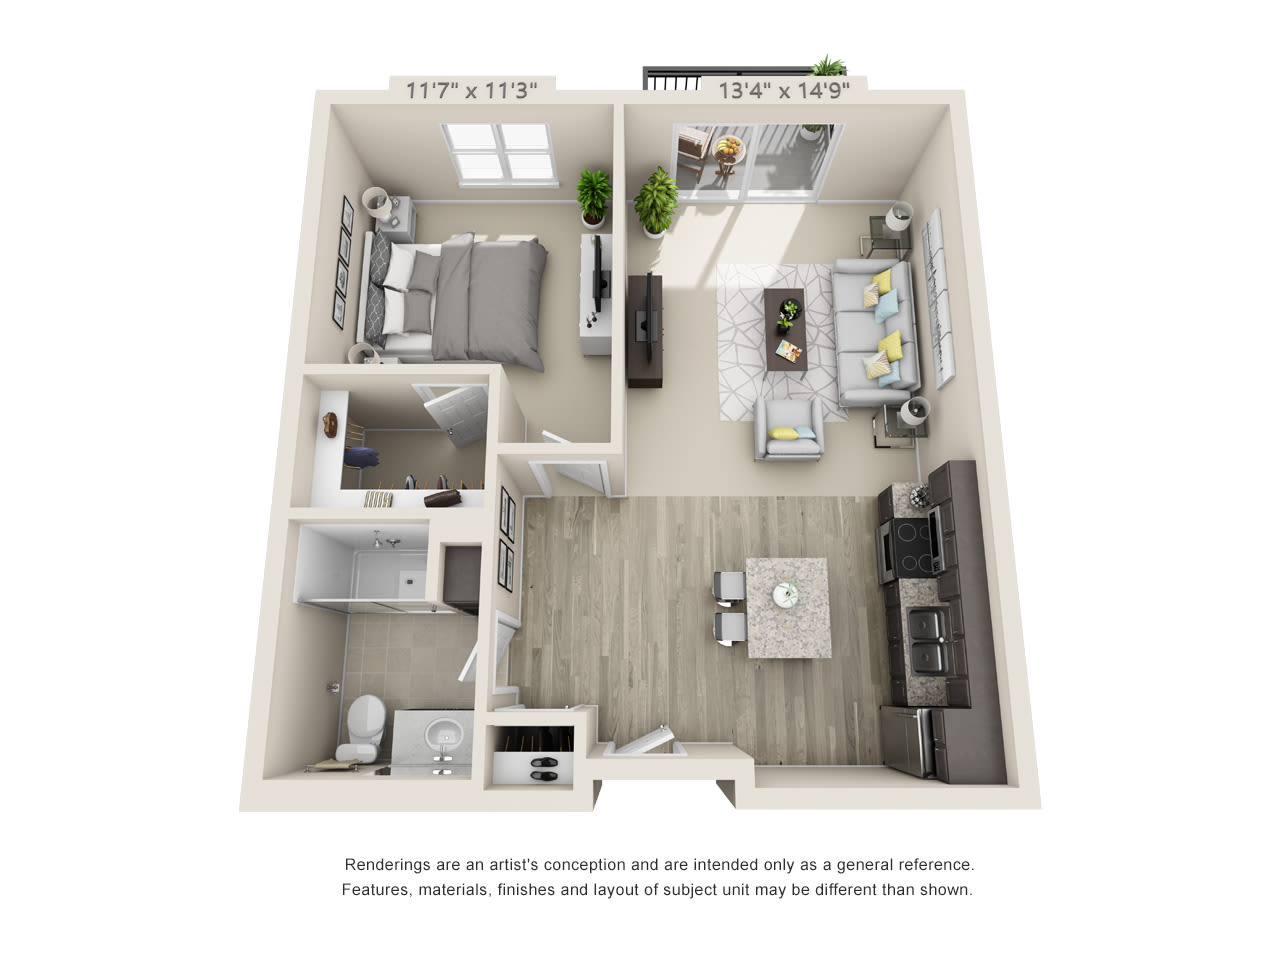 One bedroom floor plan at Talamore Senior Living in St. Cloud, Minnesota